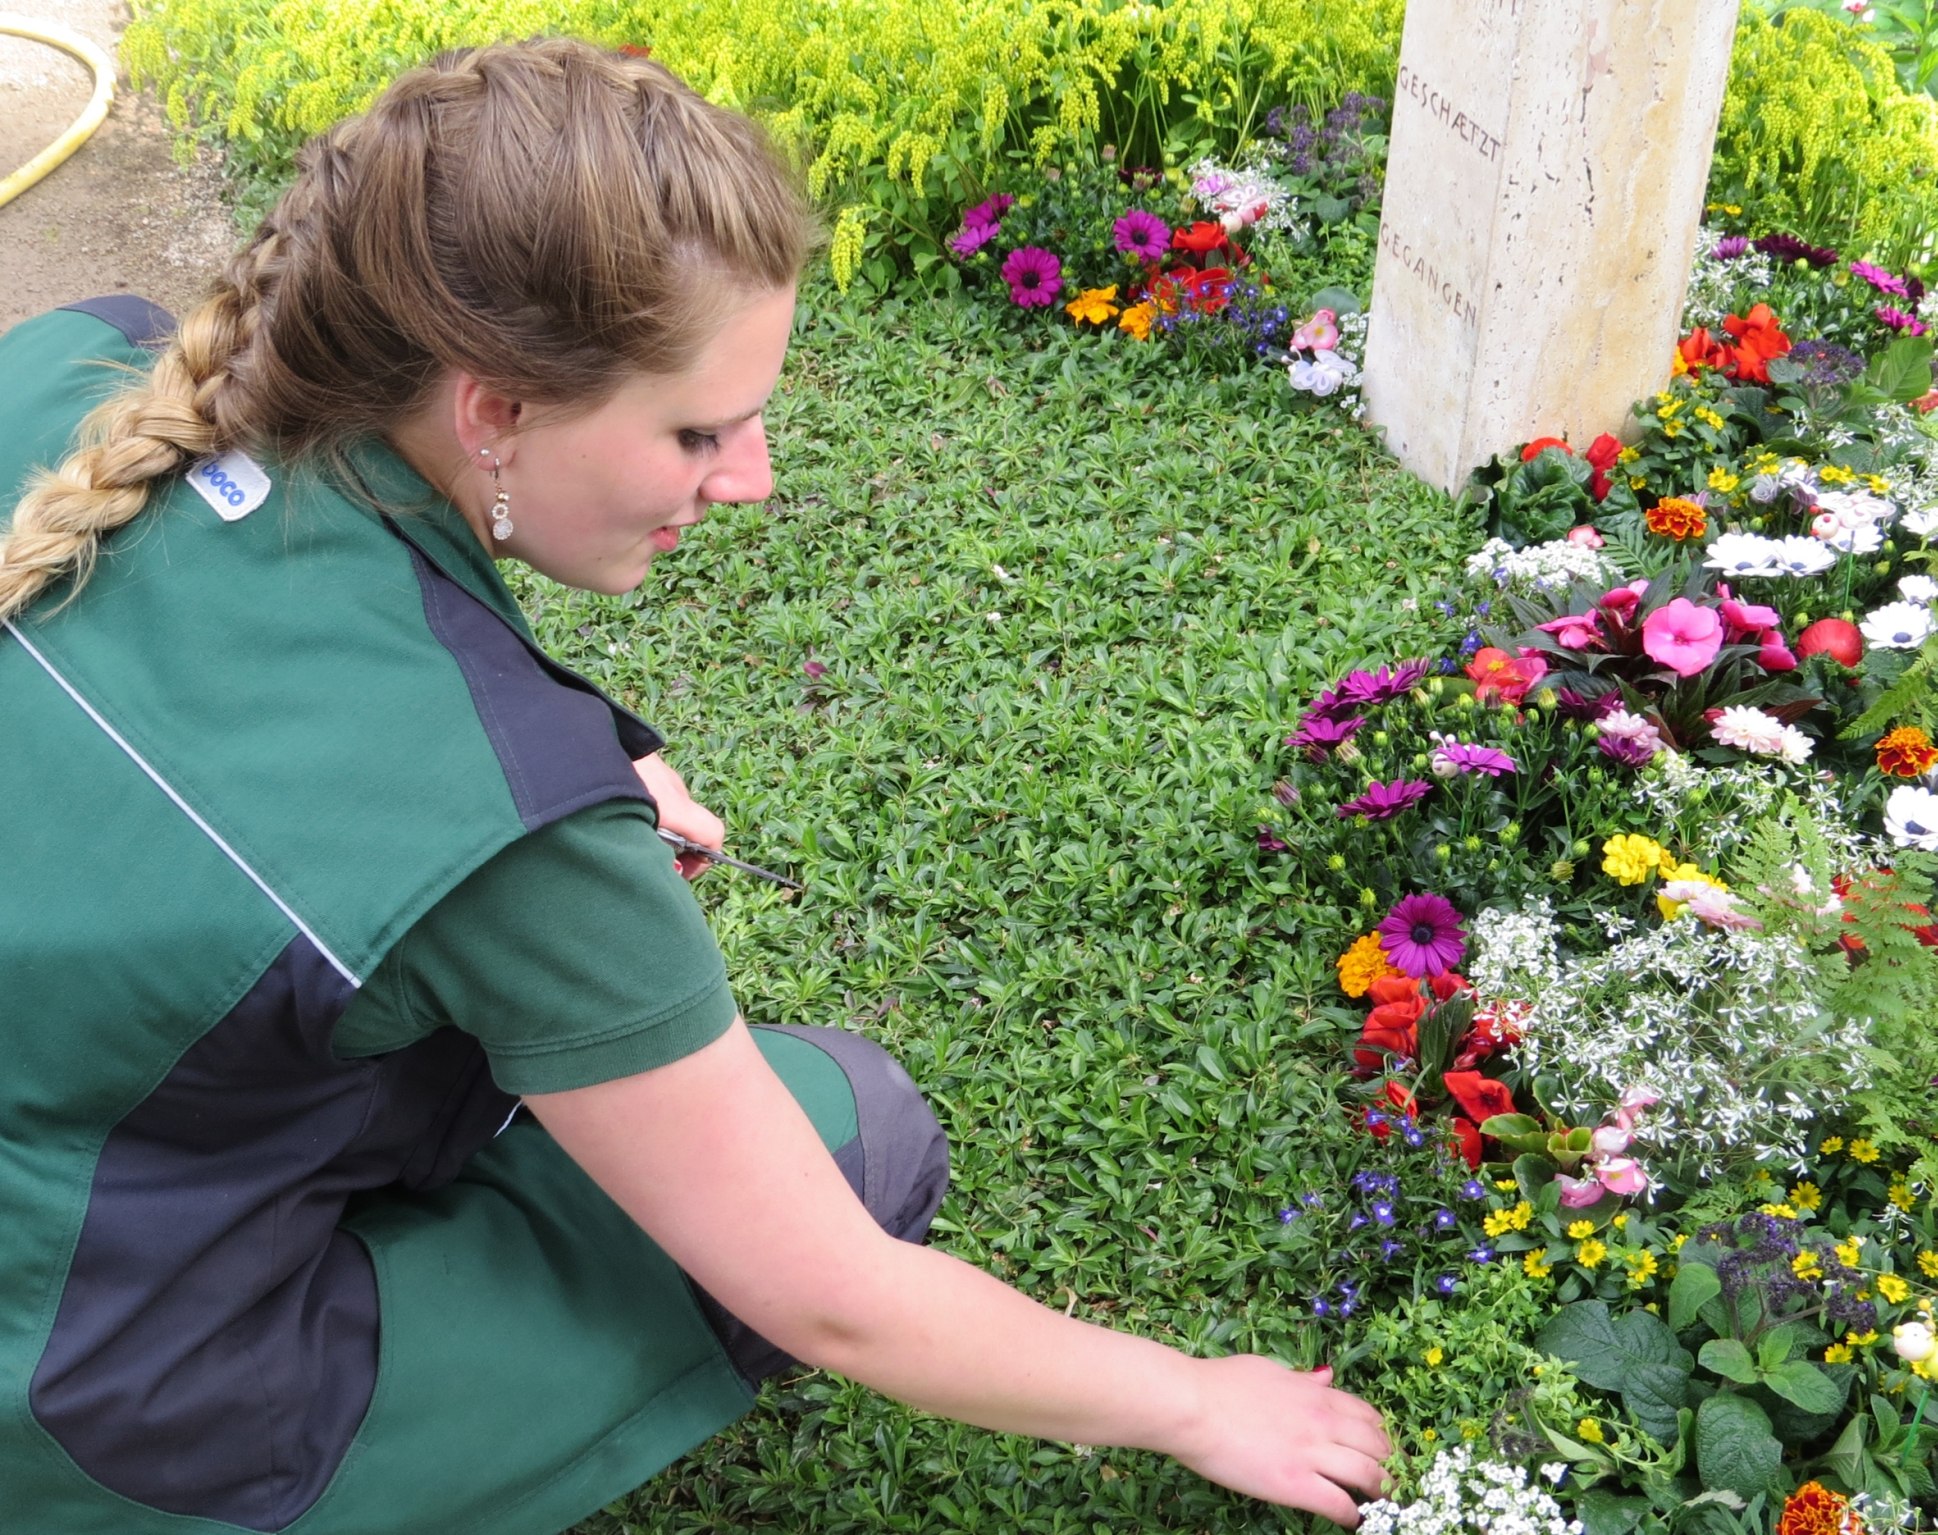 Friedhofsgärtner gestalten Friedhöfe – Orte der Ruhe